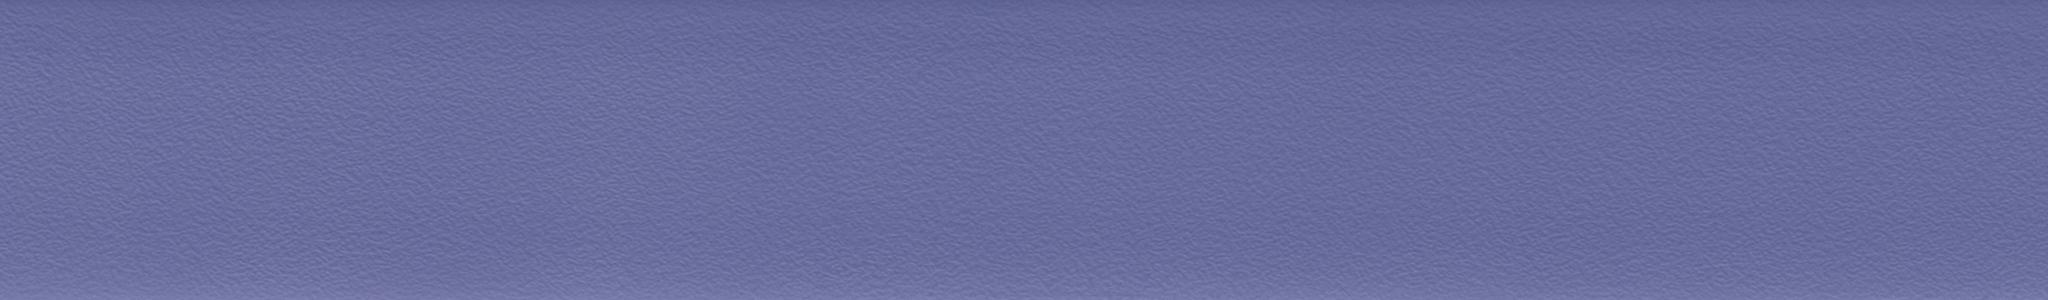 HU 15430 Bordo ABS Viola Cera XG